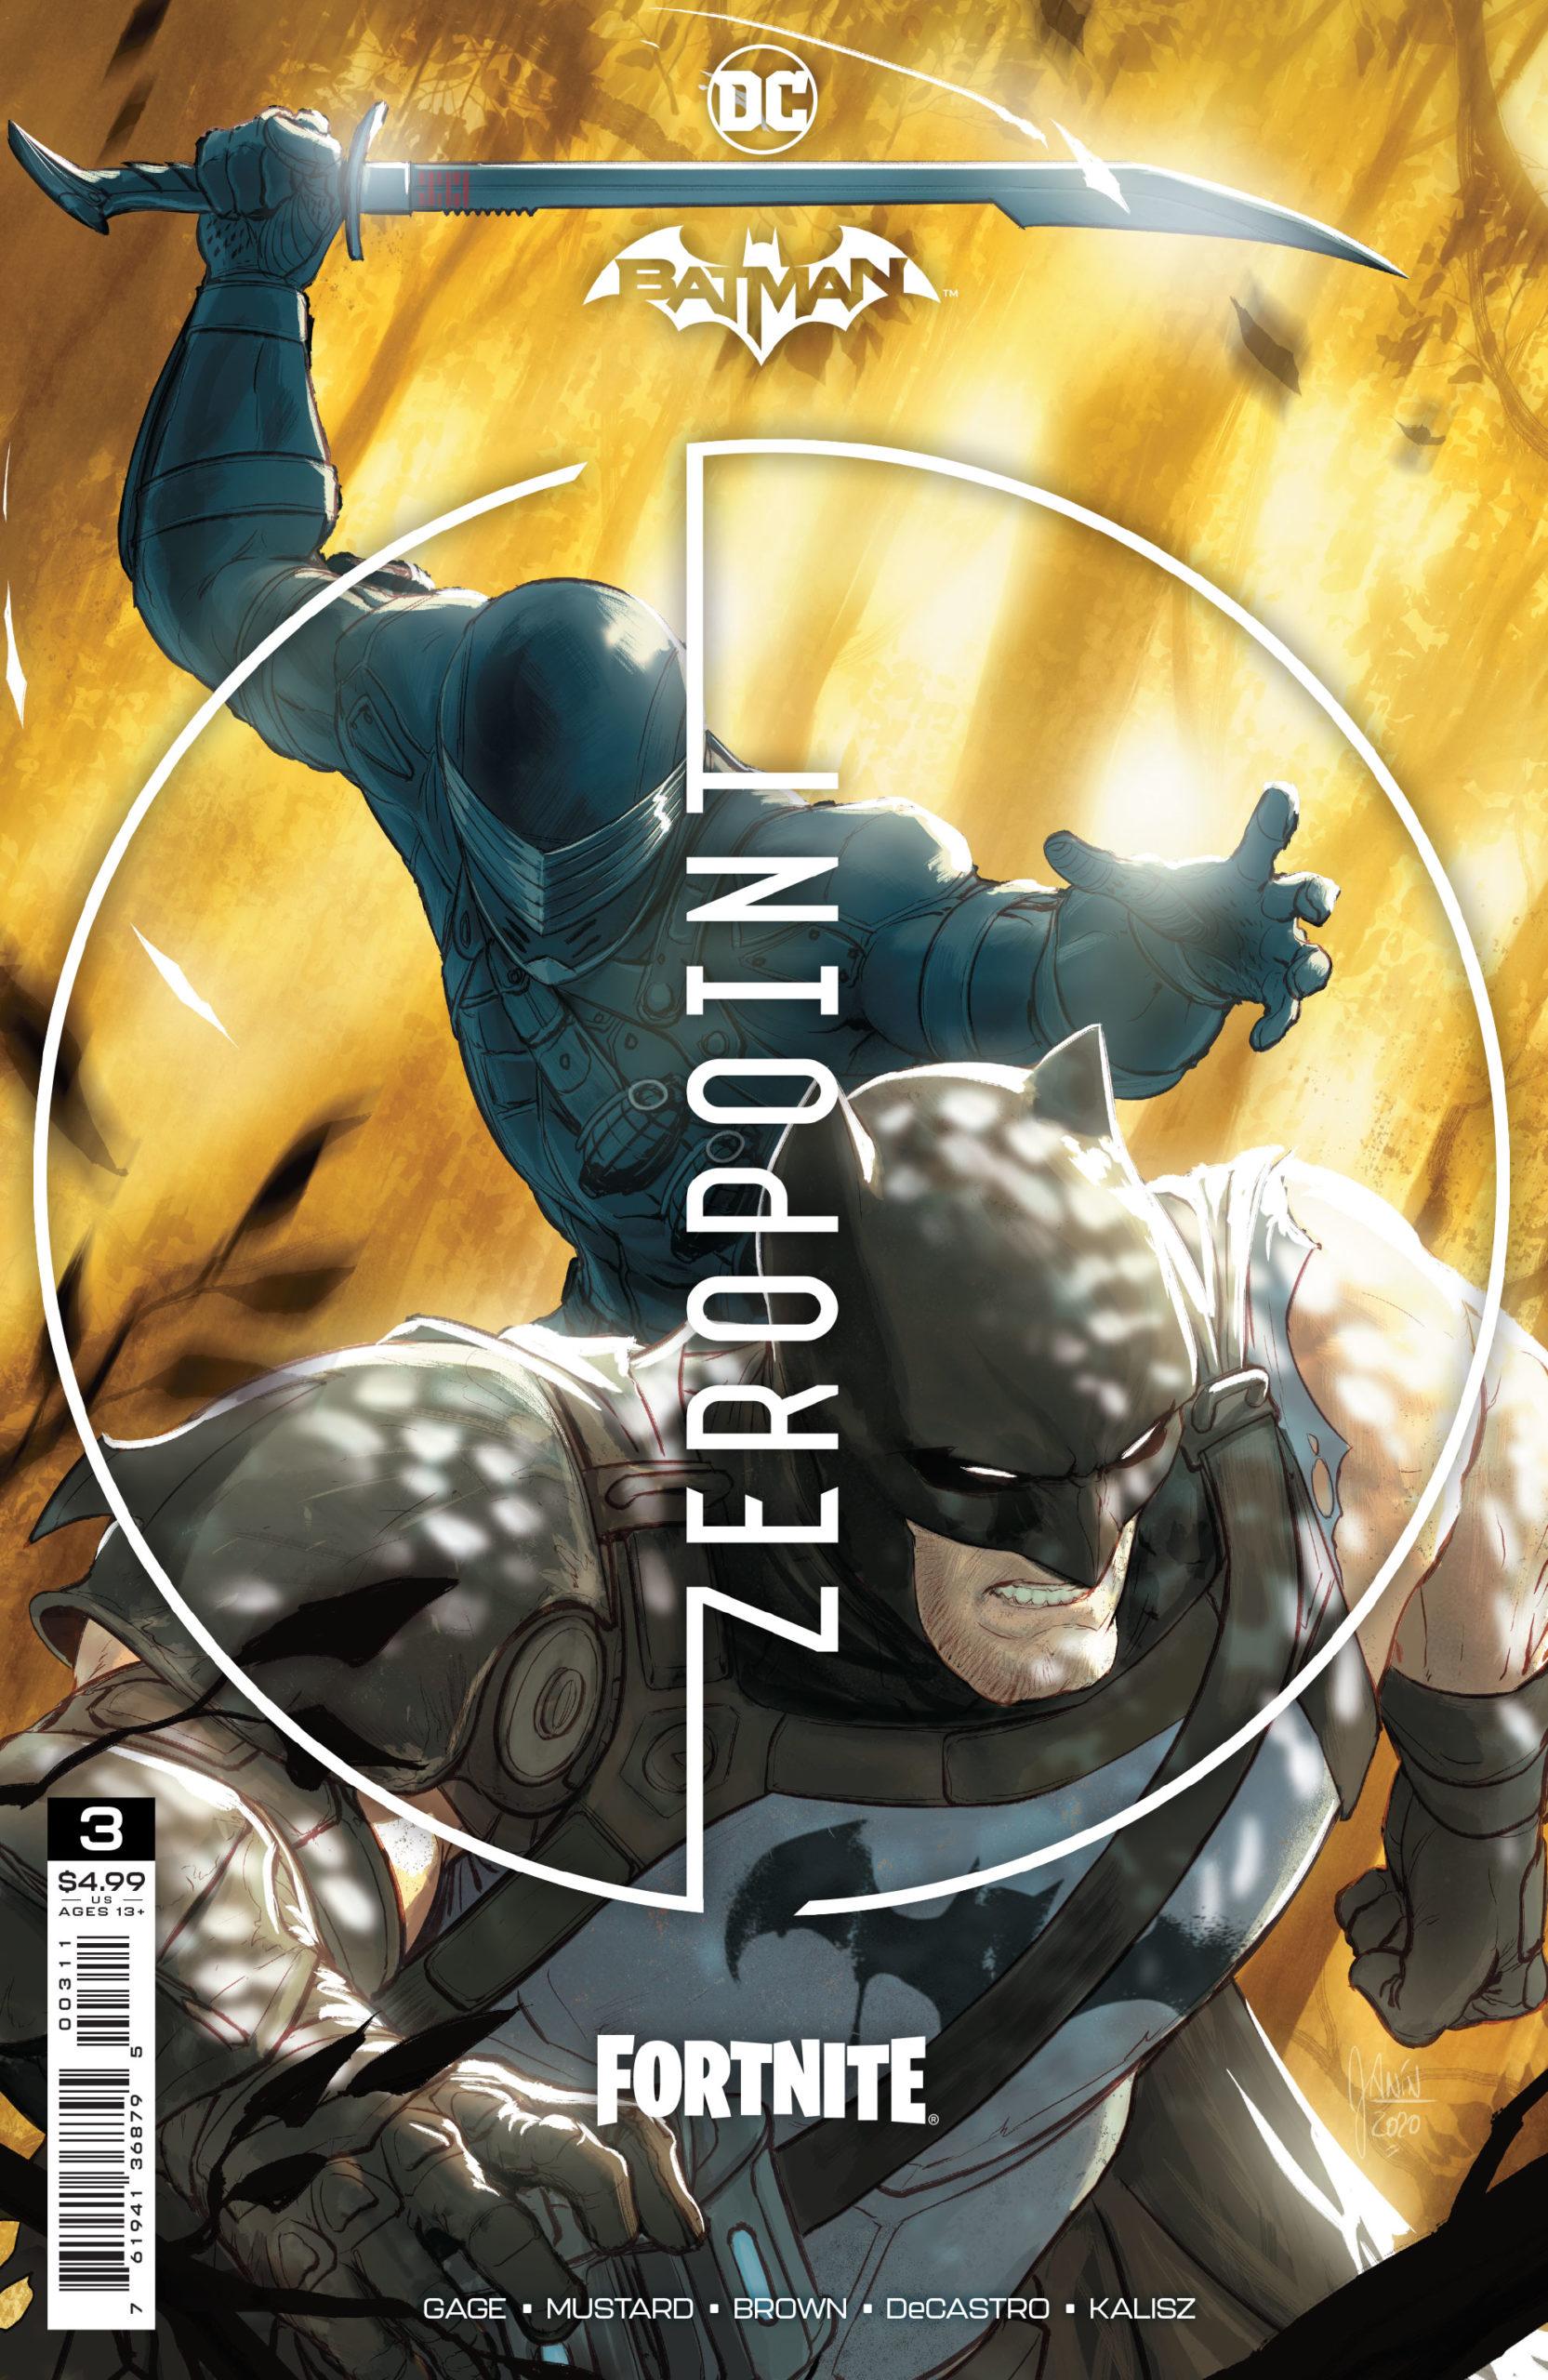 Batman.does Not Kill Fortnite Dkn Interview Batman Fortnite Zero Point Creative Team Christos Gage And Reilly Brown Dark Knight News